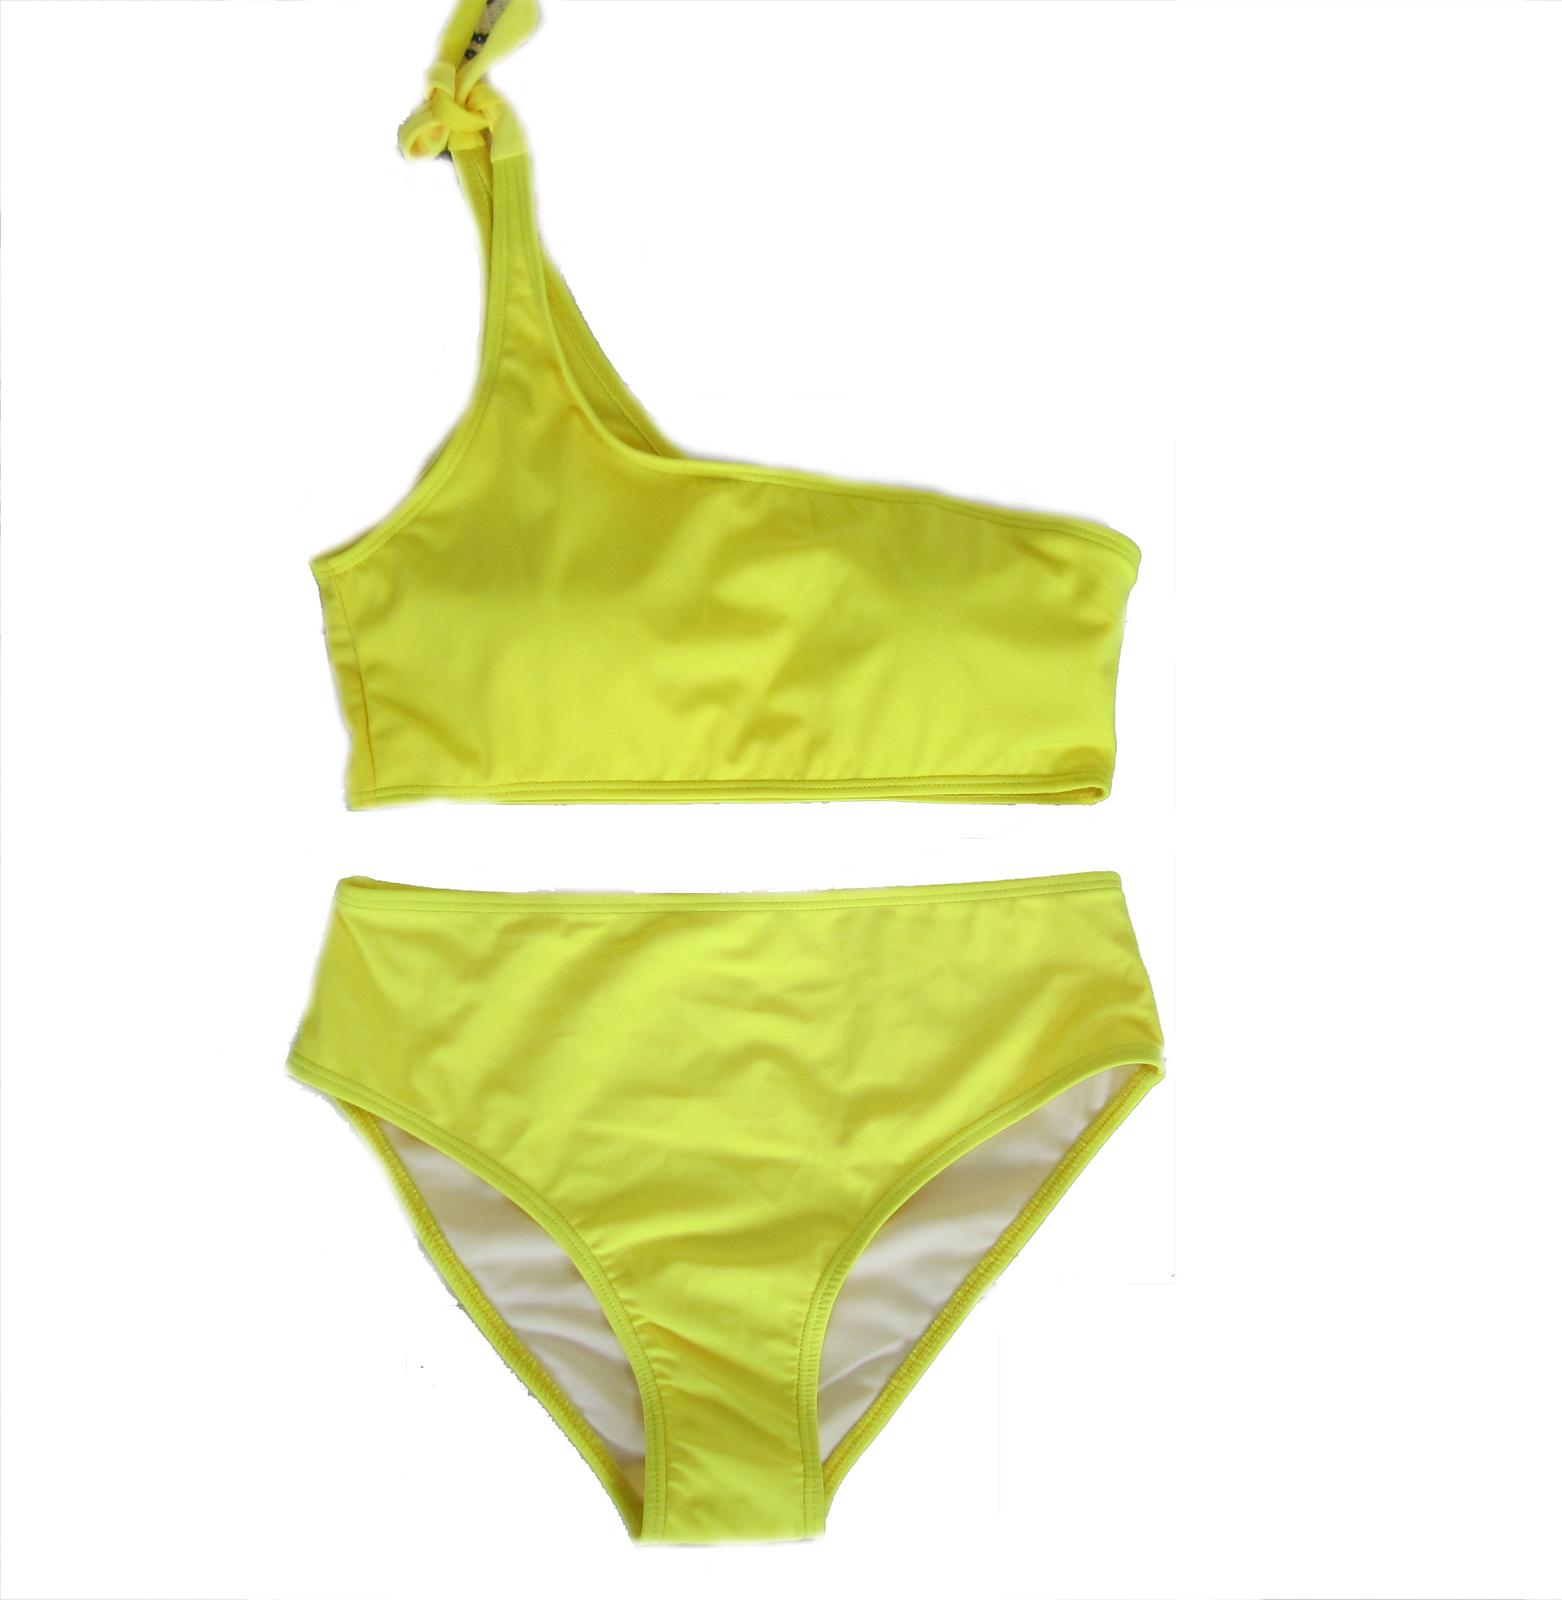 Women's One Shoulder Padded Two Pieces Bikini Set